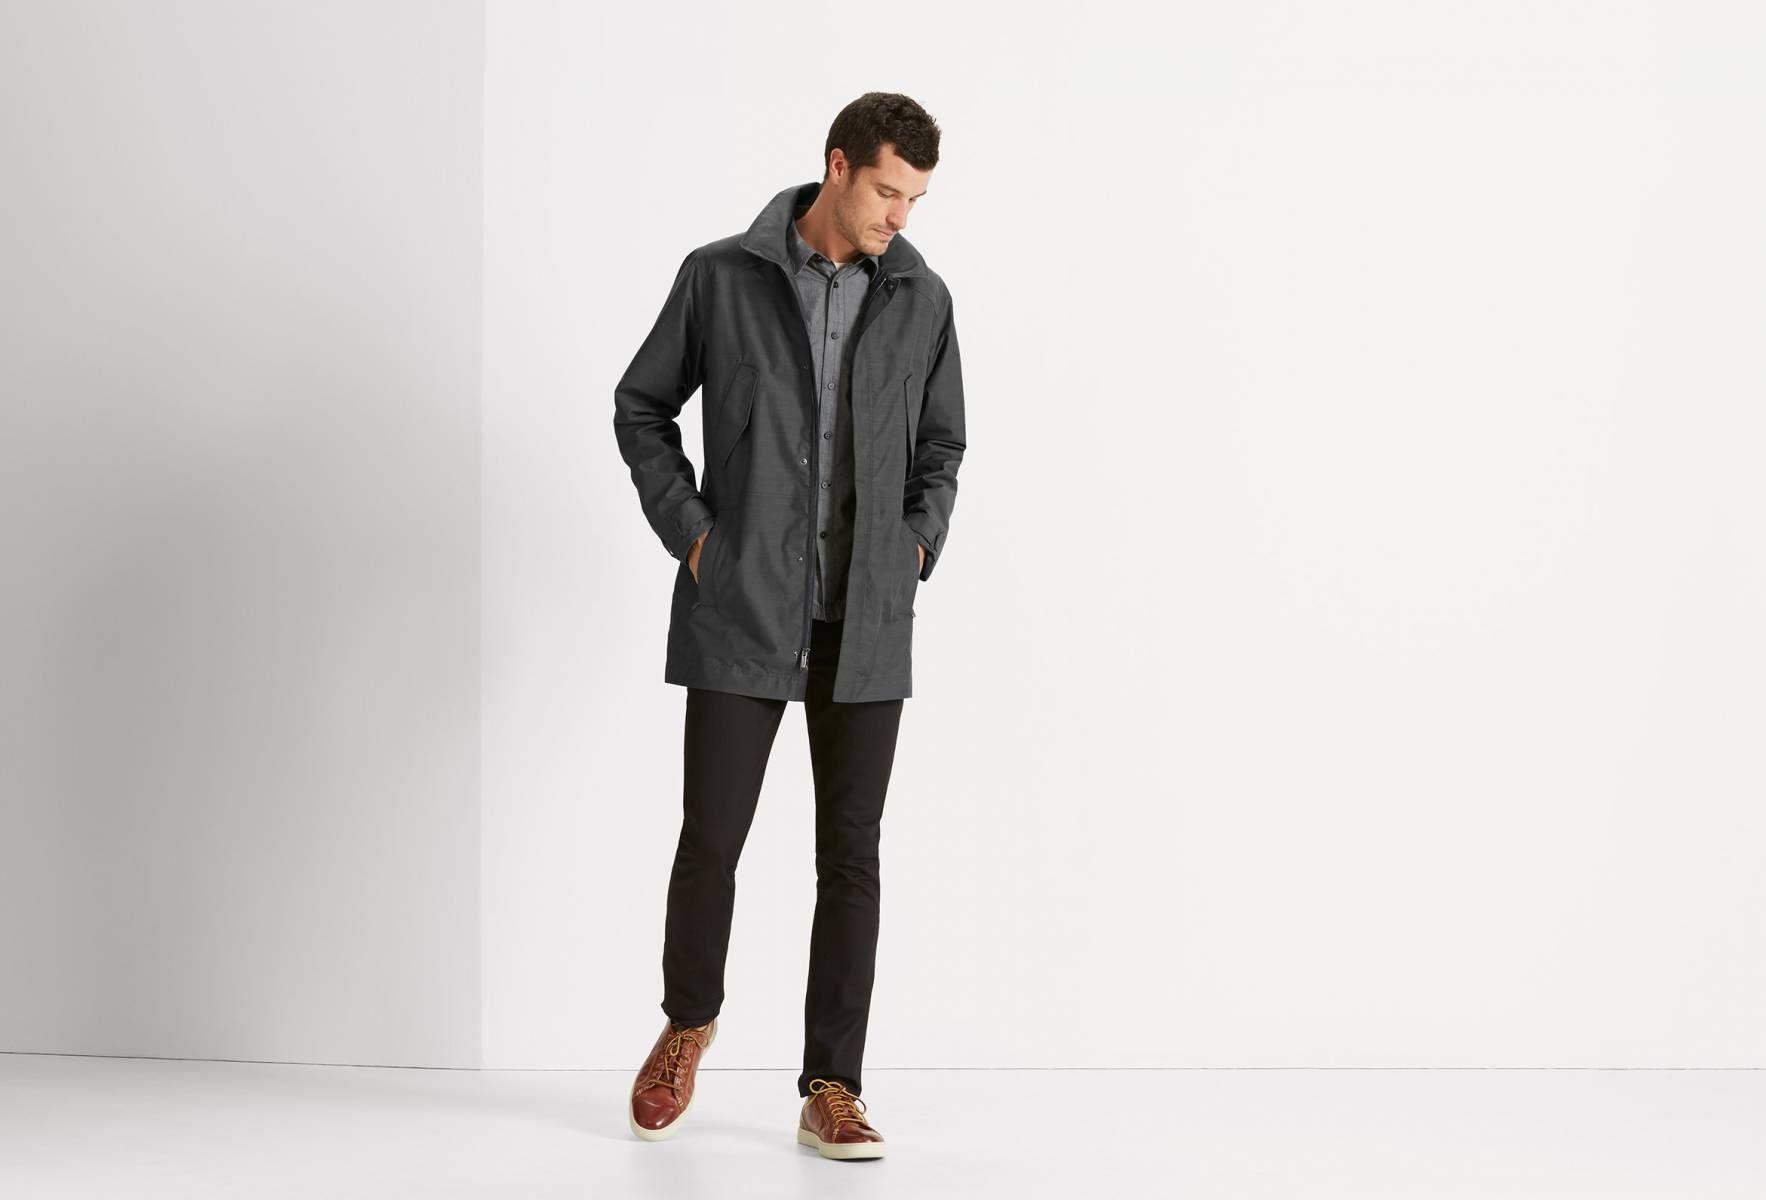 Quintessentshell Trench Men Nau Clothing Mens Rain Jacket Sustainable Clothing Brands Trench Coat Men [ 1200 x 1766 Pixel ]